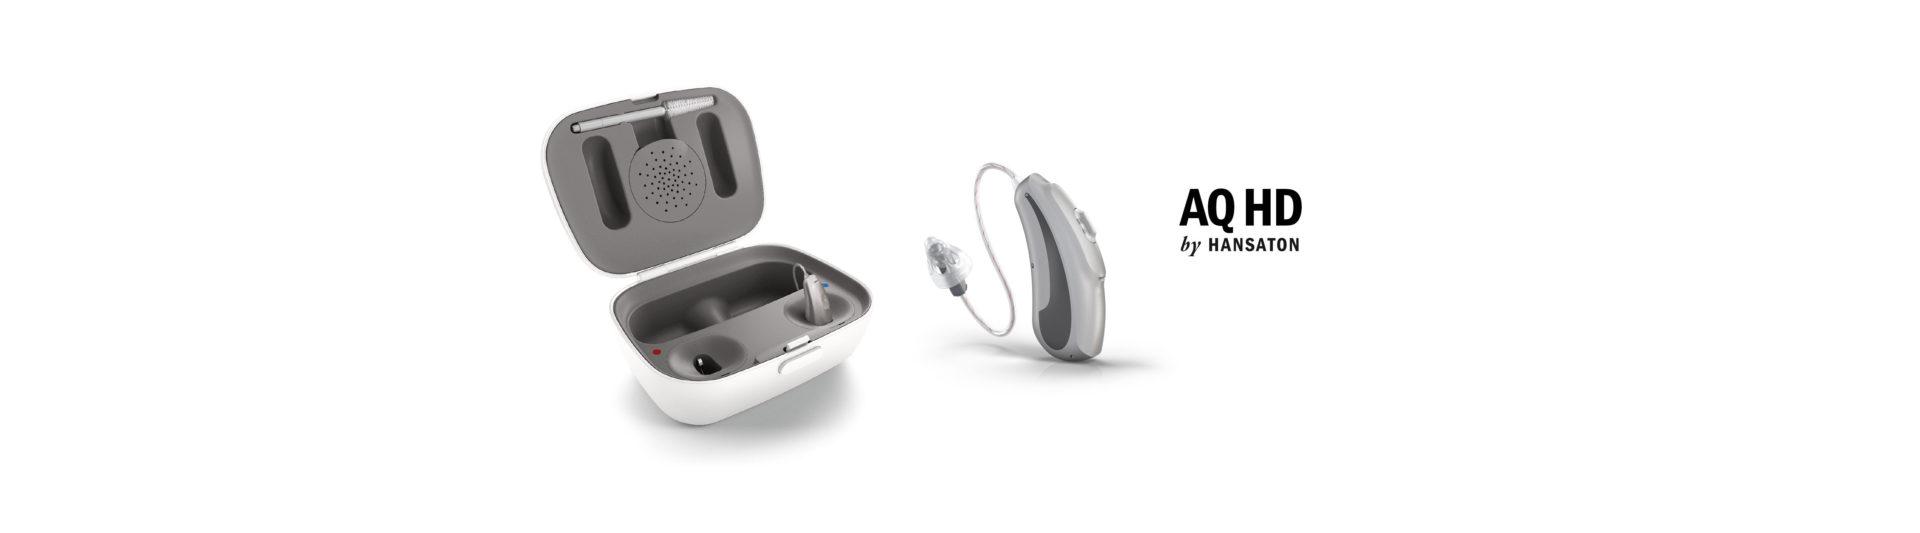 AQ HD product family